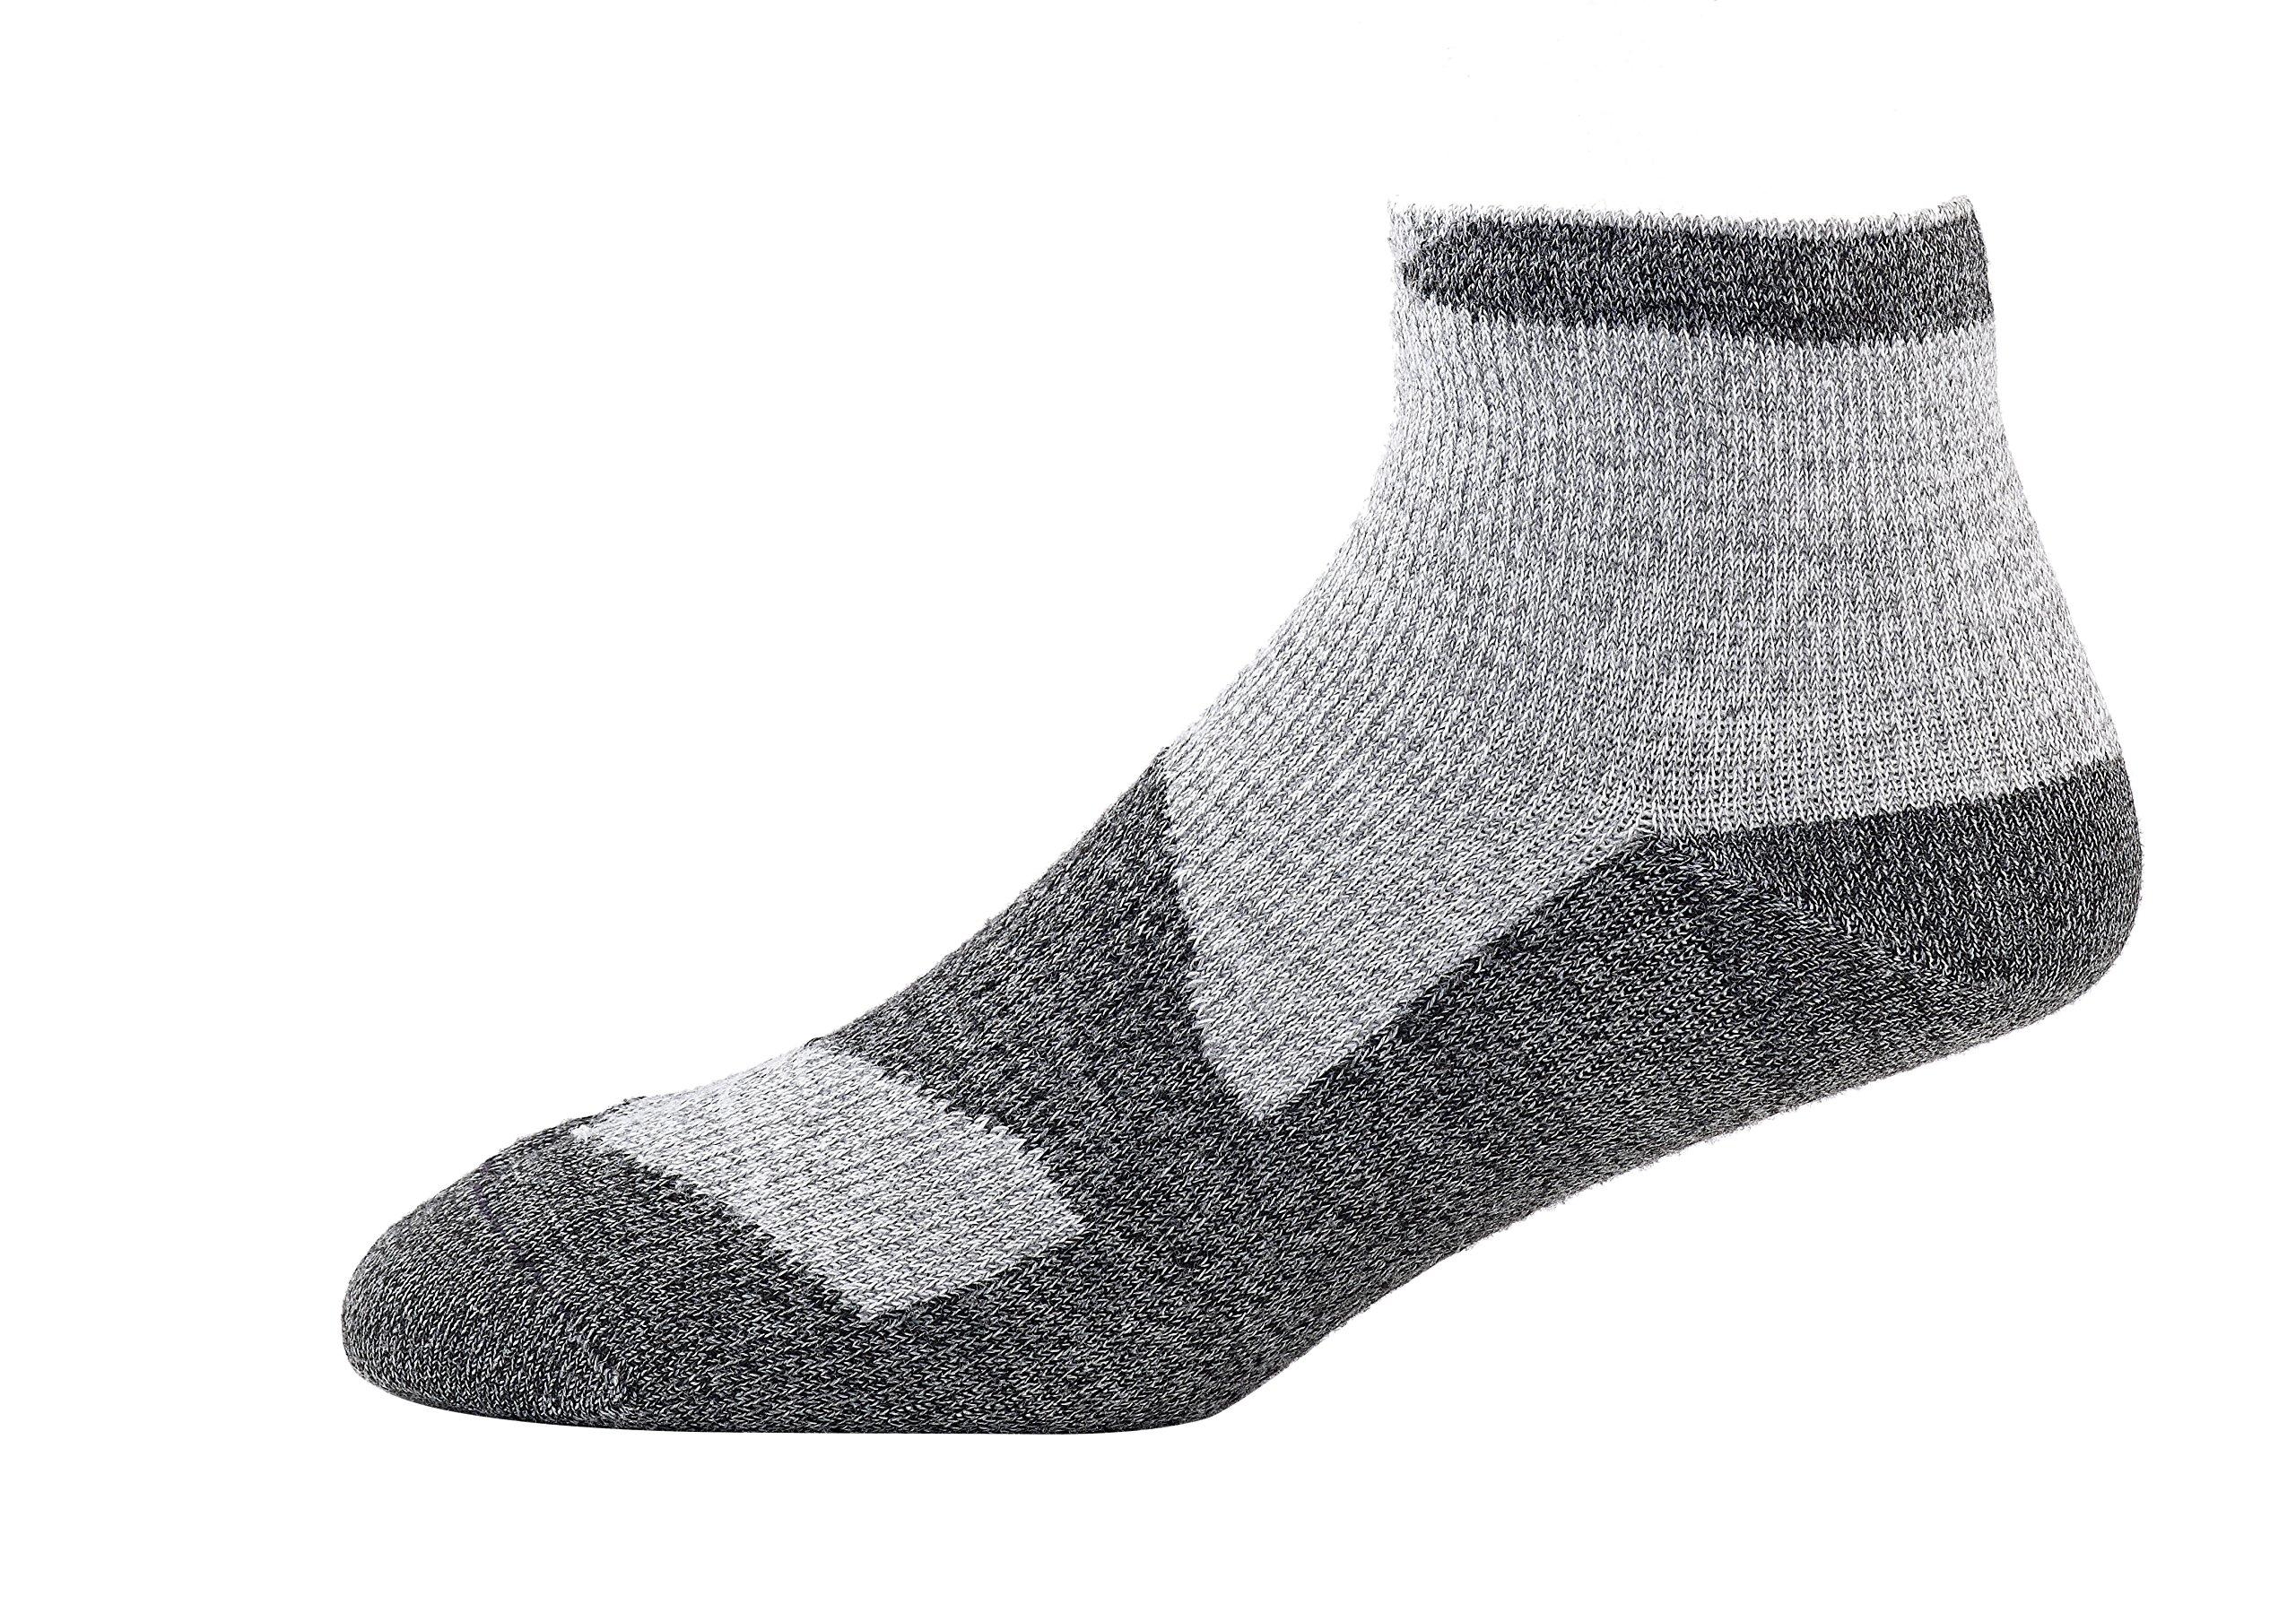 SealSkinz Walking Thin Socklet, Medium - Grey Marl/Dark Grey. With a Helicase brand sock ring